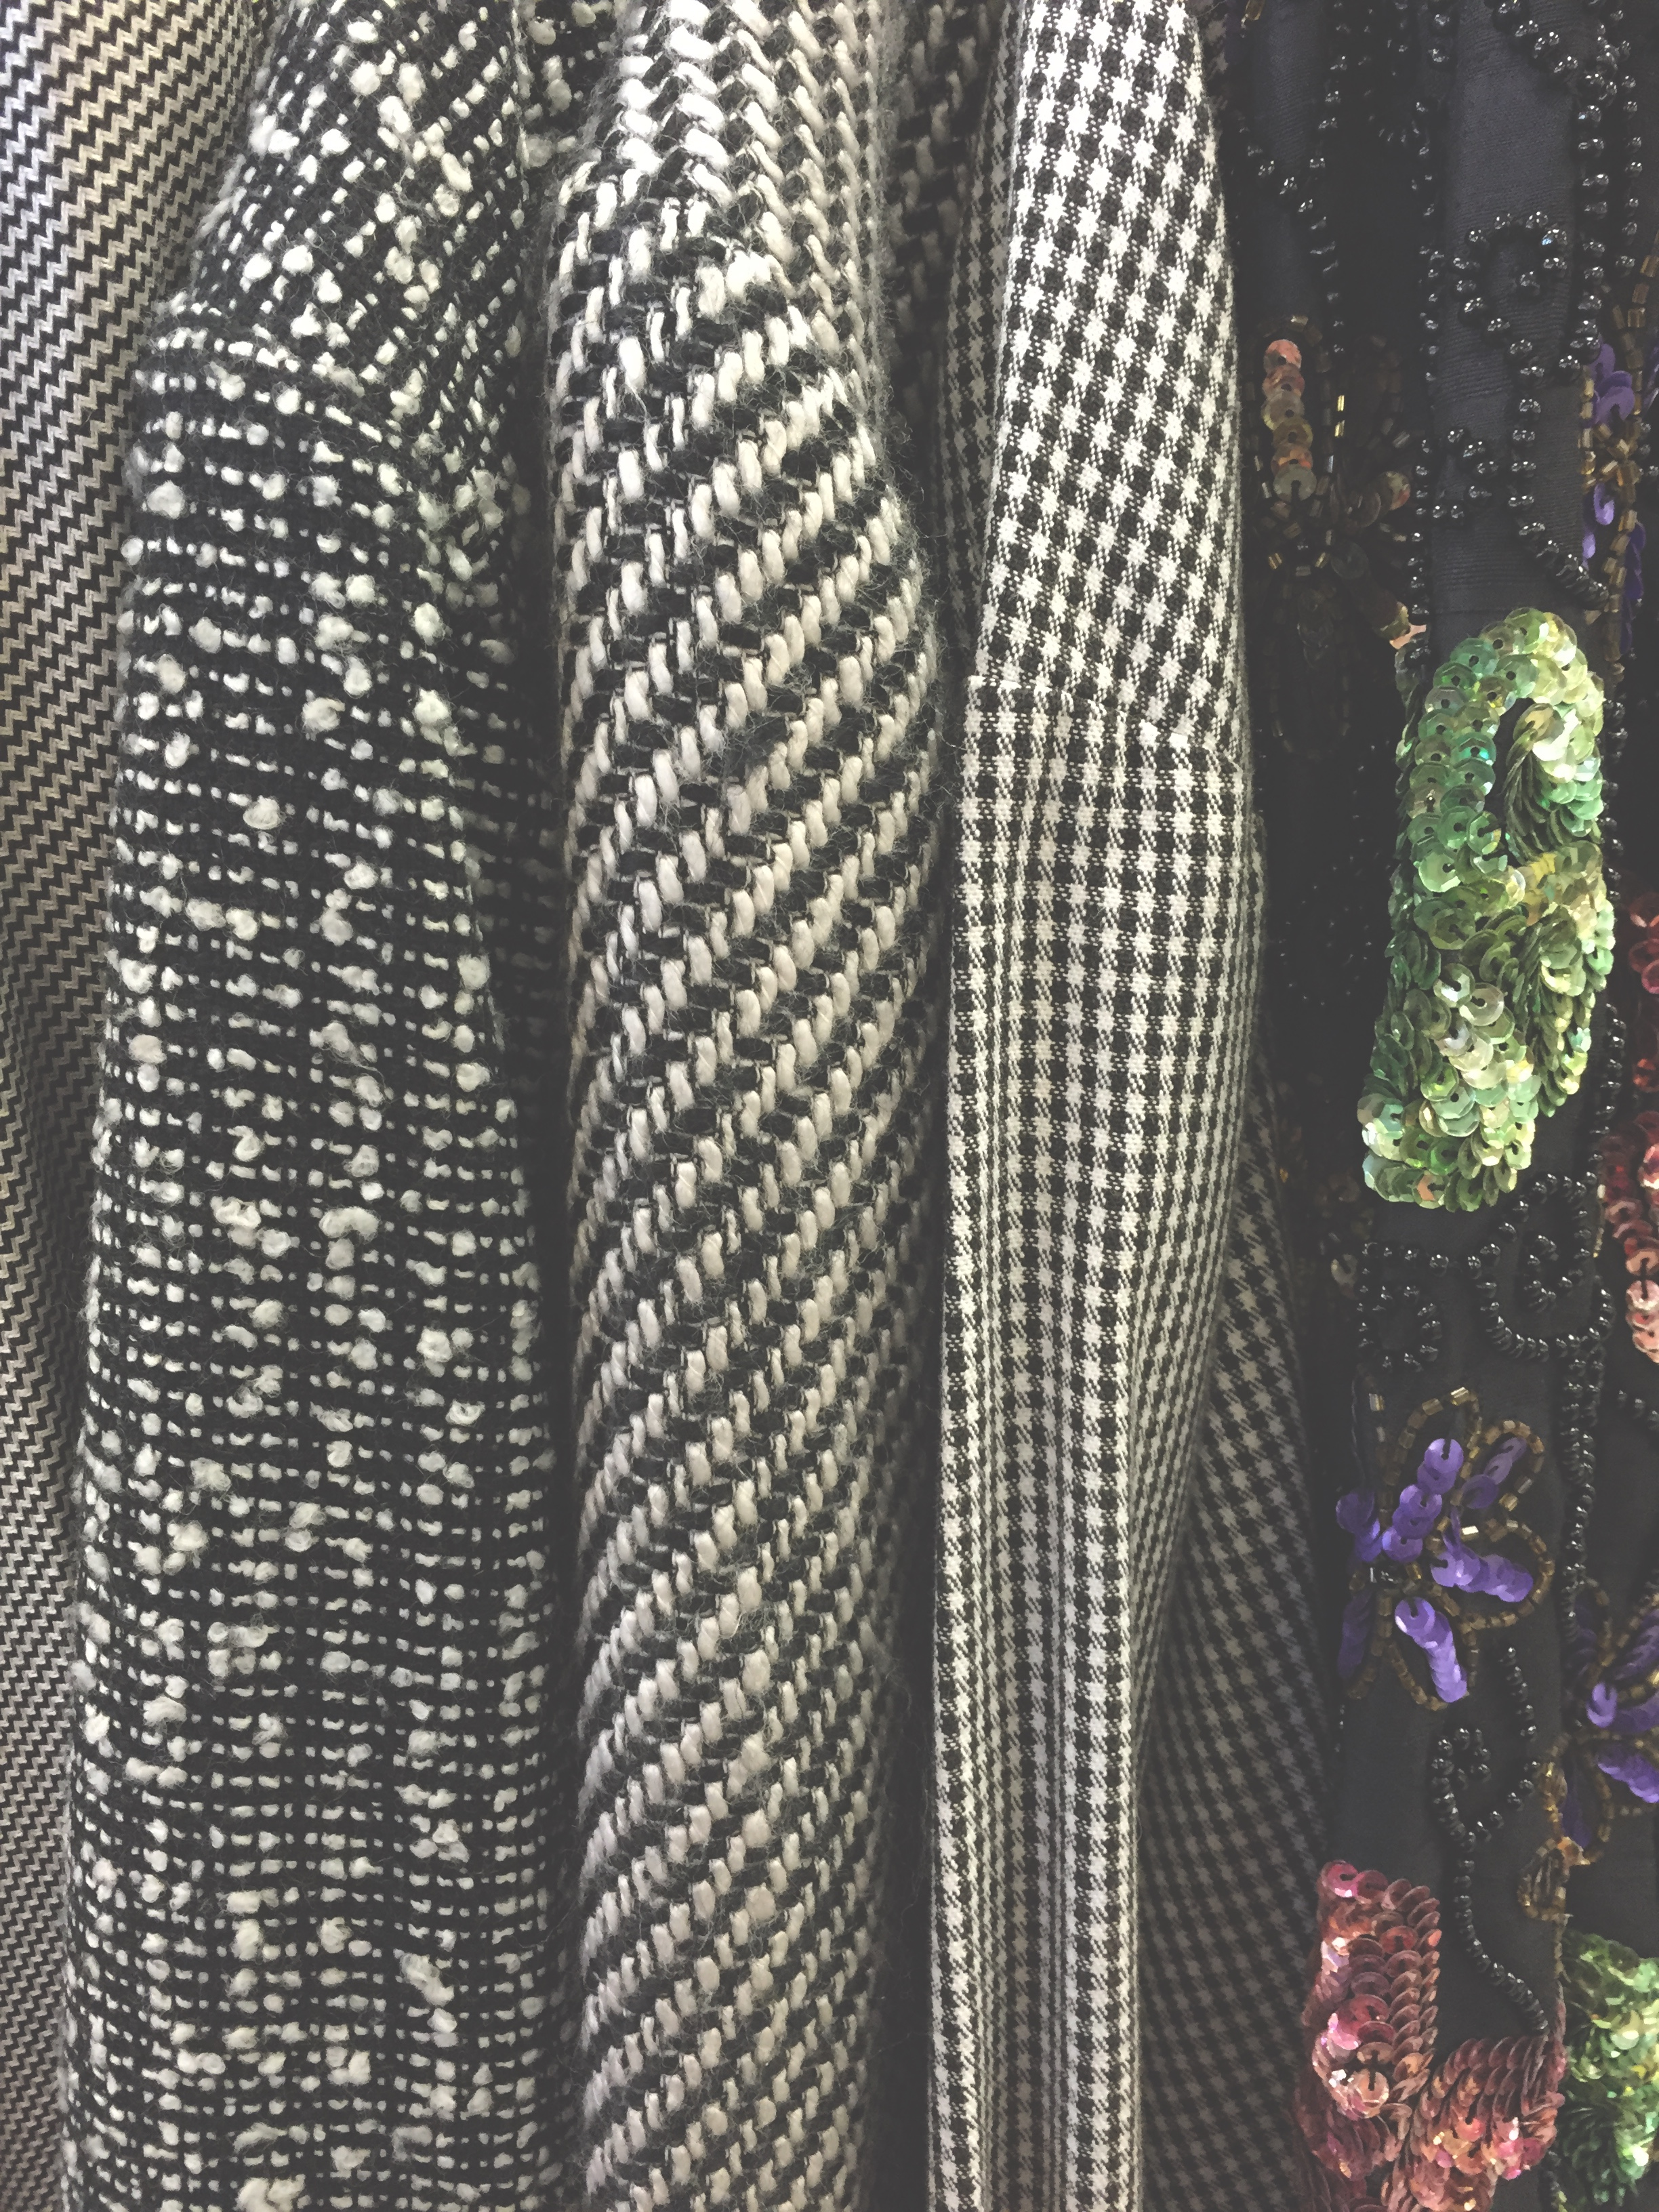 Colors, patterns, textures!!